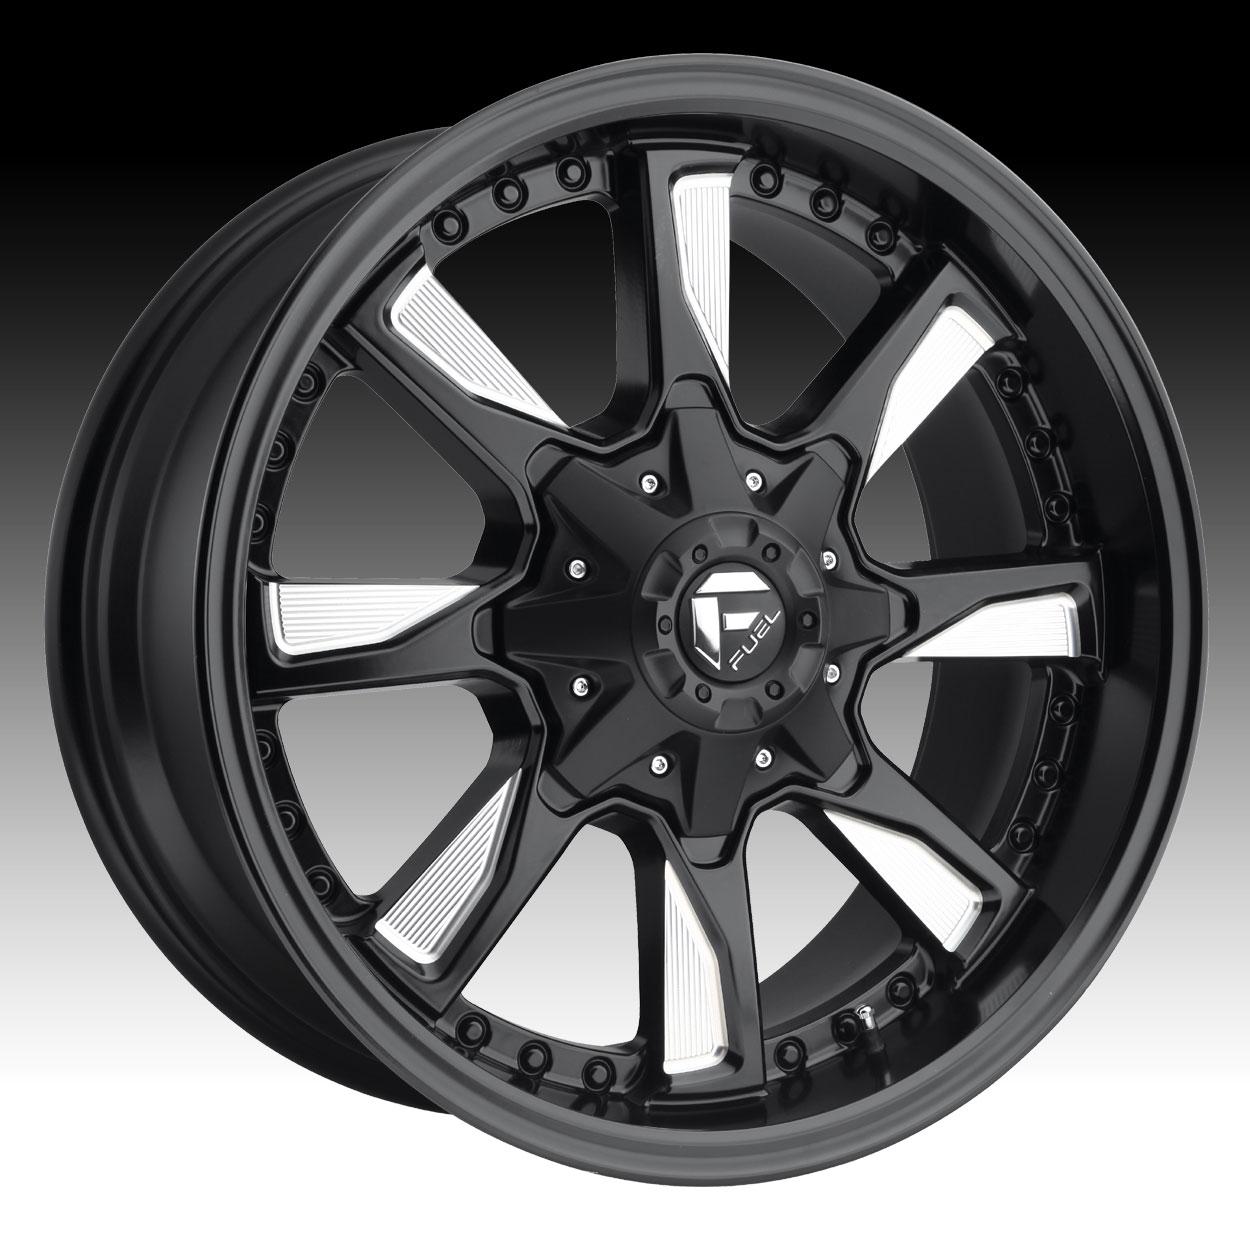 Truck Wheels Rims : Fuel hydro d matte black milled custom truck wheels